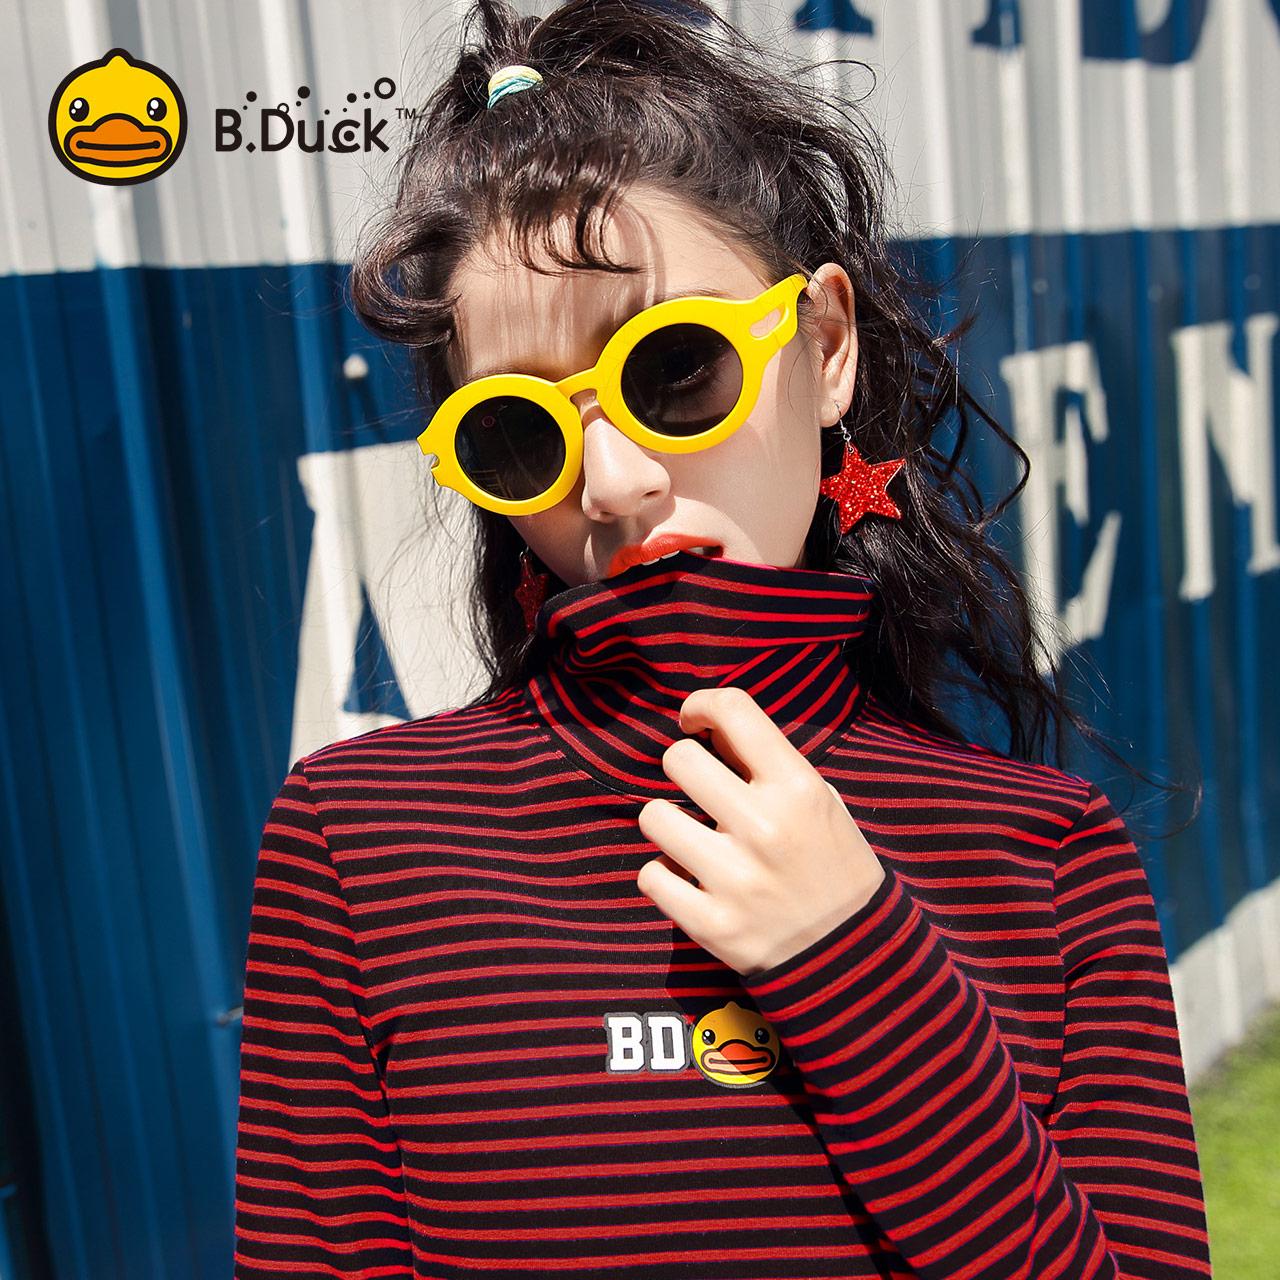 B.Duck小黄鸭ICONIC女装2018秋新款长袖条纹T恤女字母高领打底衫